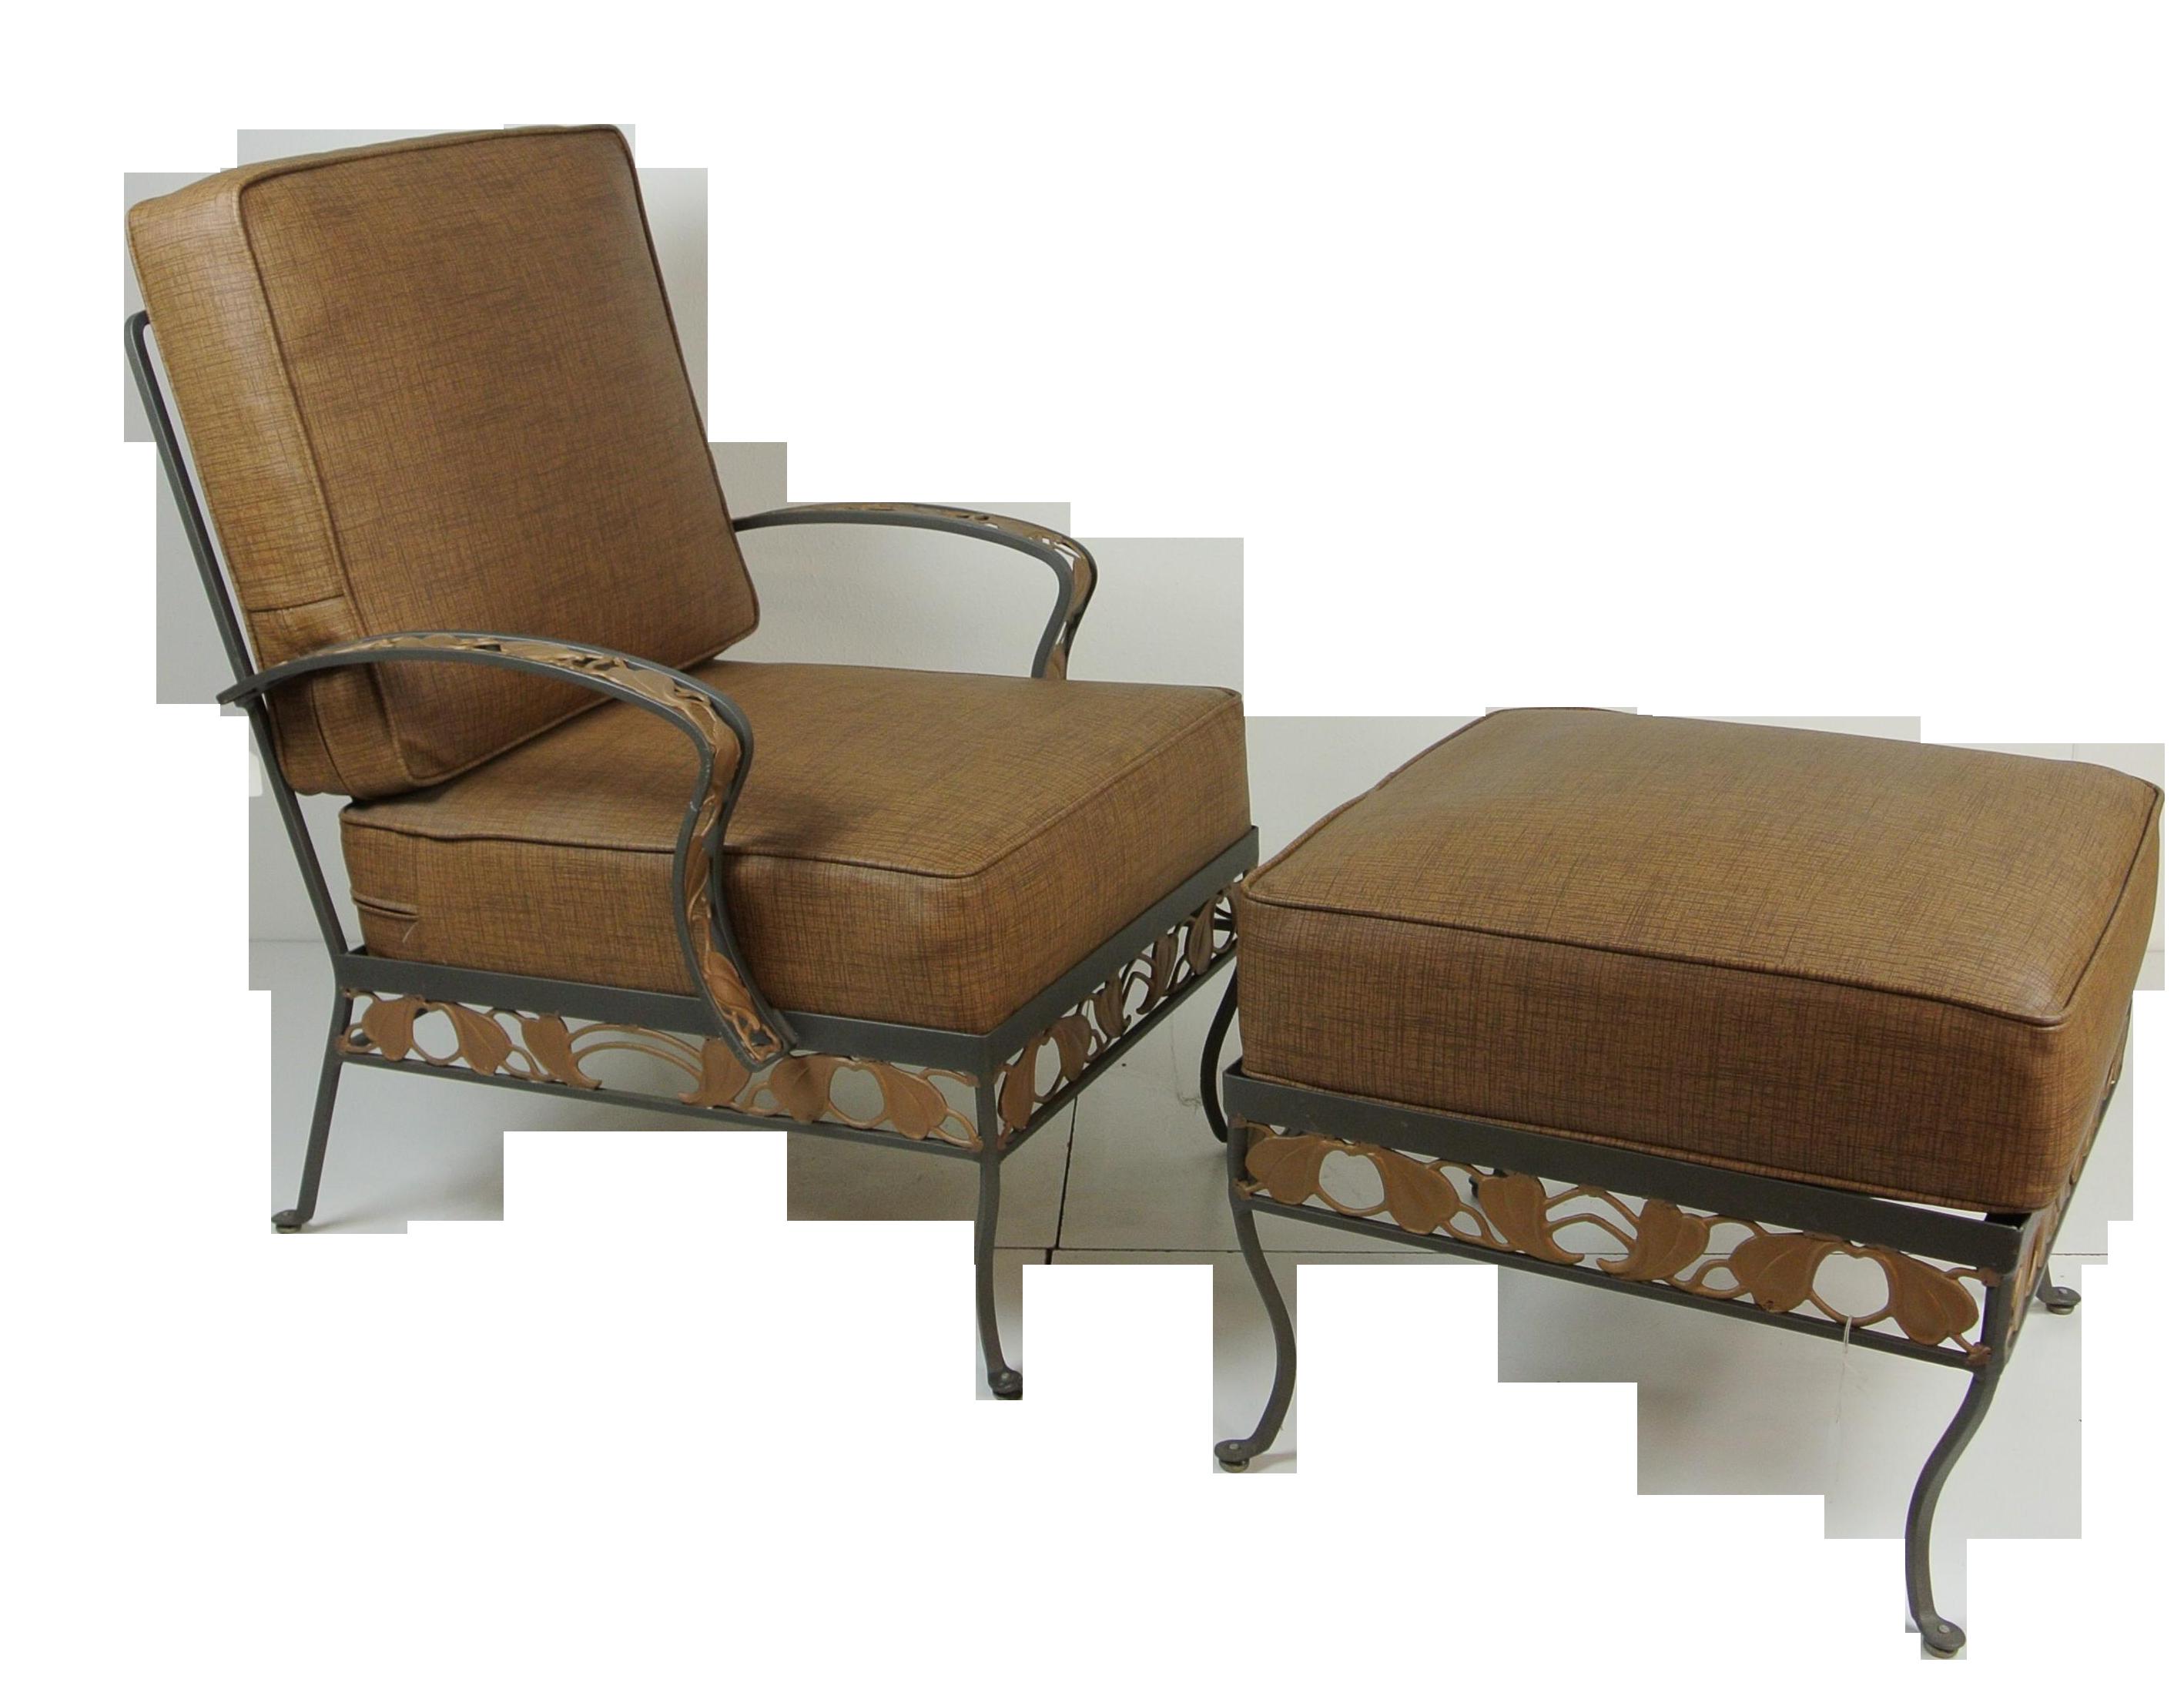 Brown Jordan Wrought Iron Club Chair  Ottoman Chairish - Jordan outdoor furniture